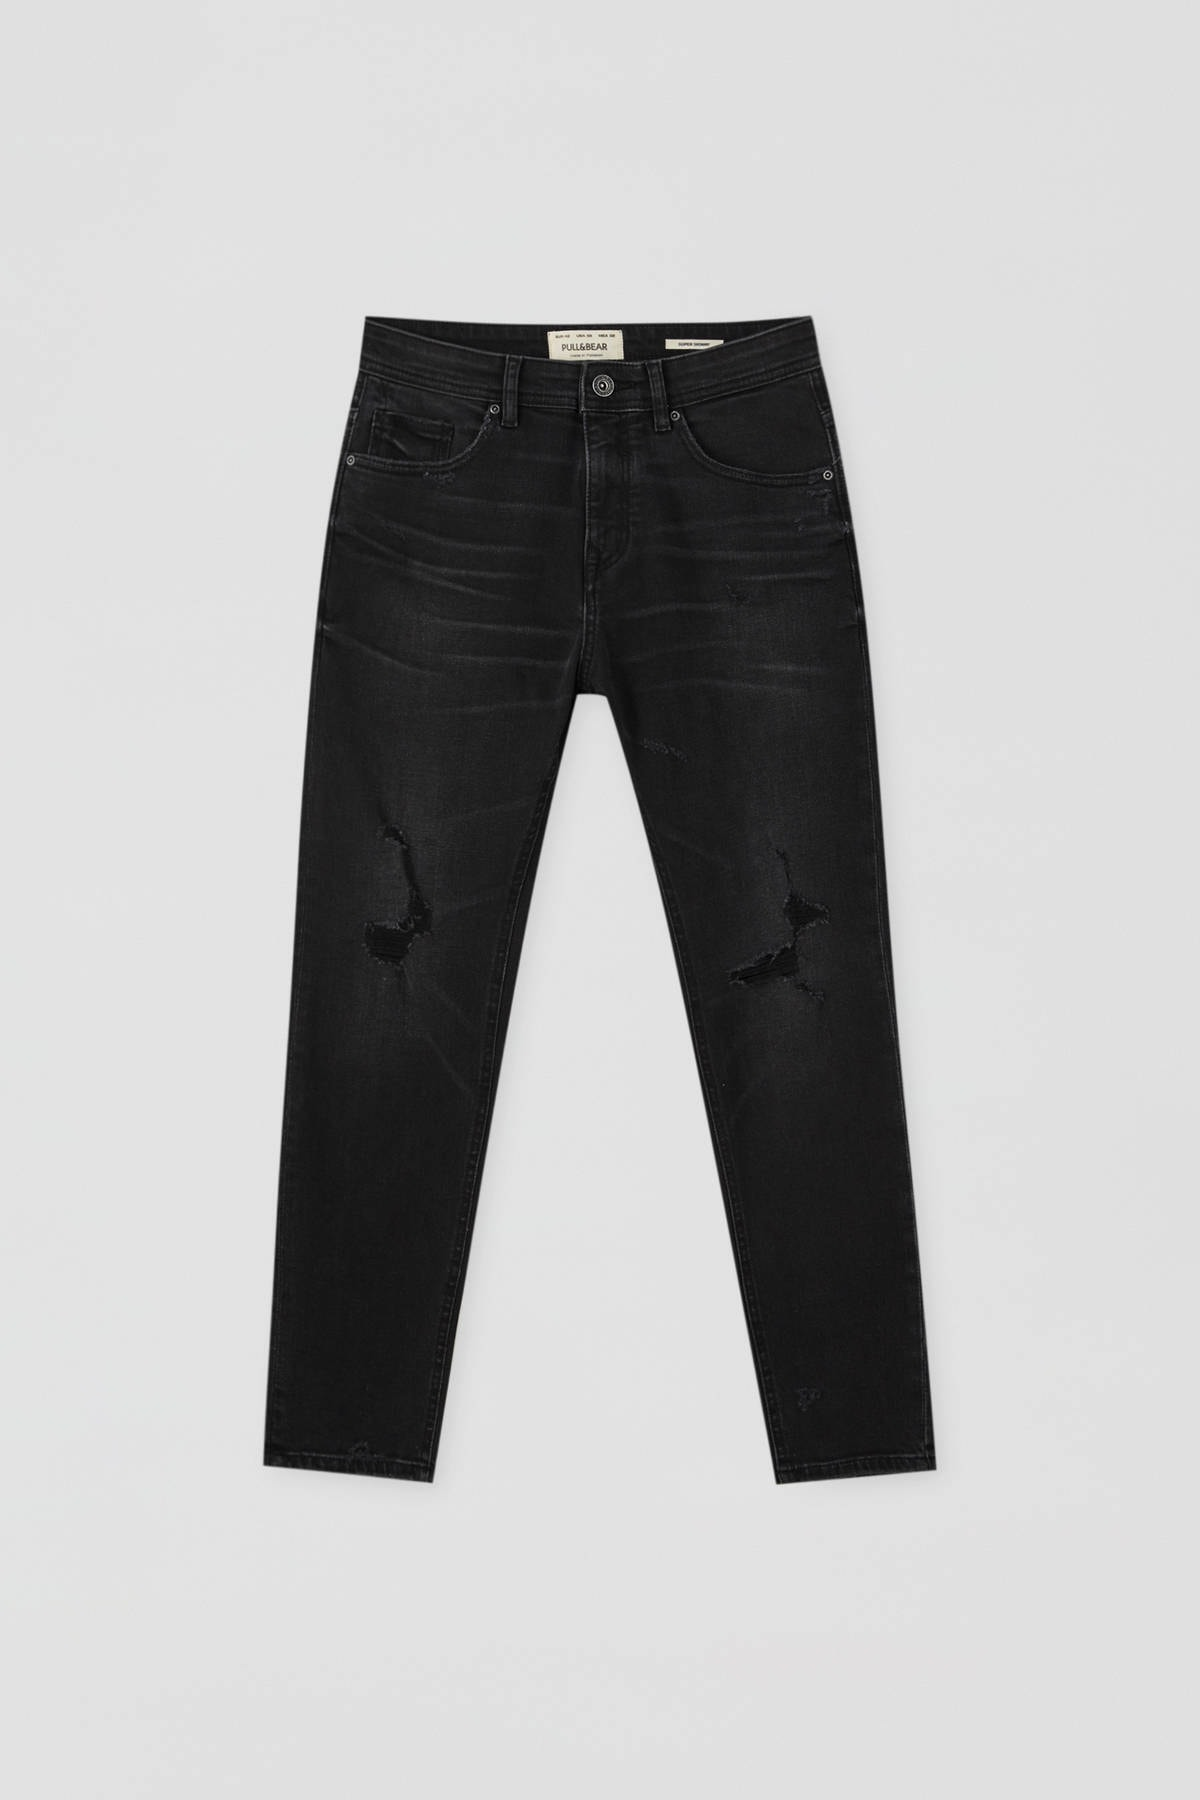 Pull & Bear Erkek Soluk Siyah Distressed Detaylı Basic Super Skinny Fit Jean 09683500